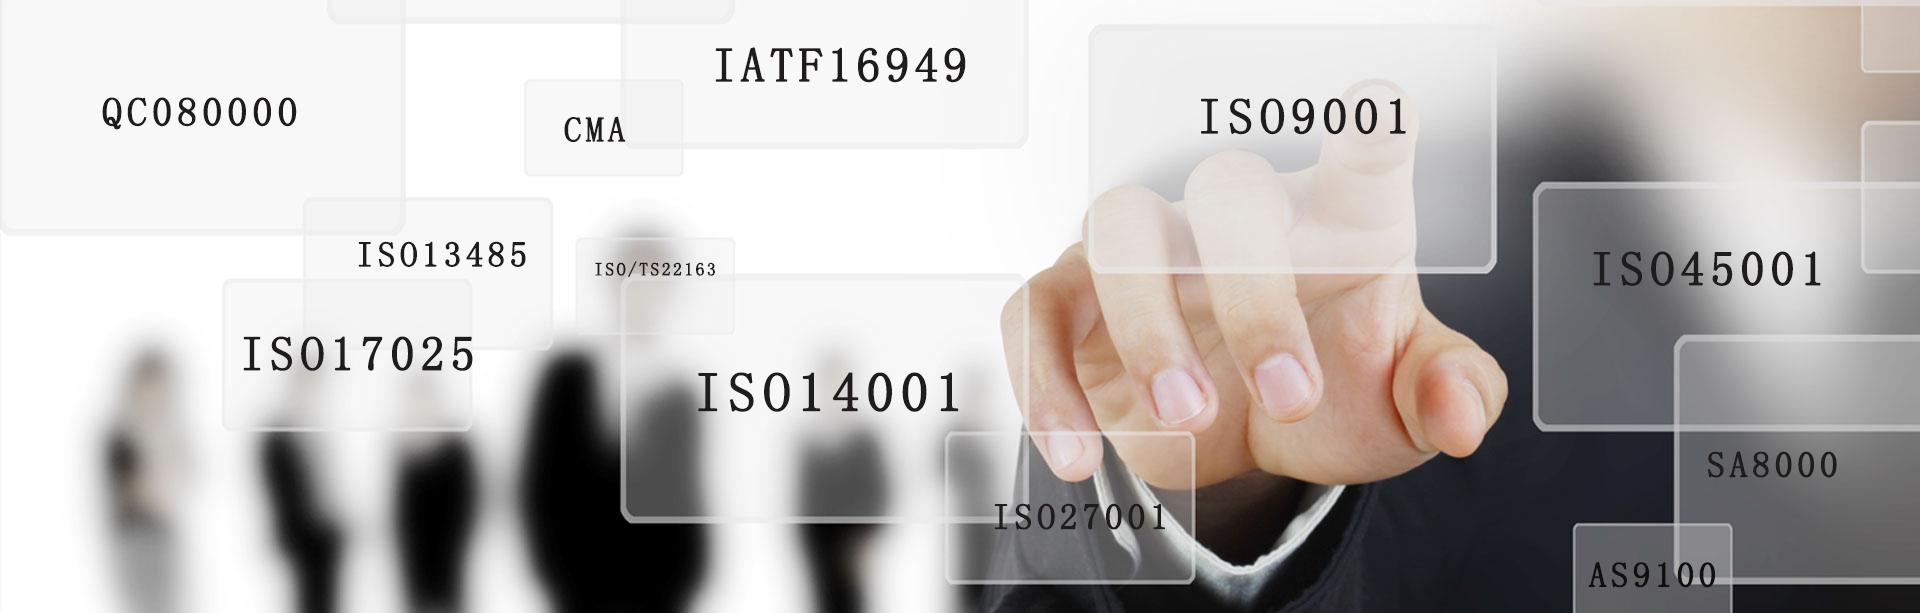 IATF16949相关资料